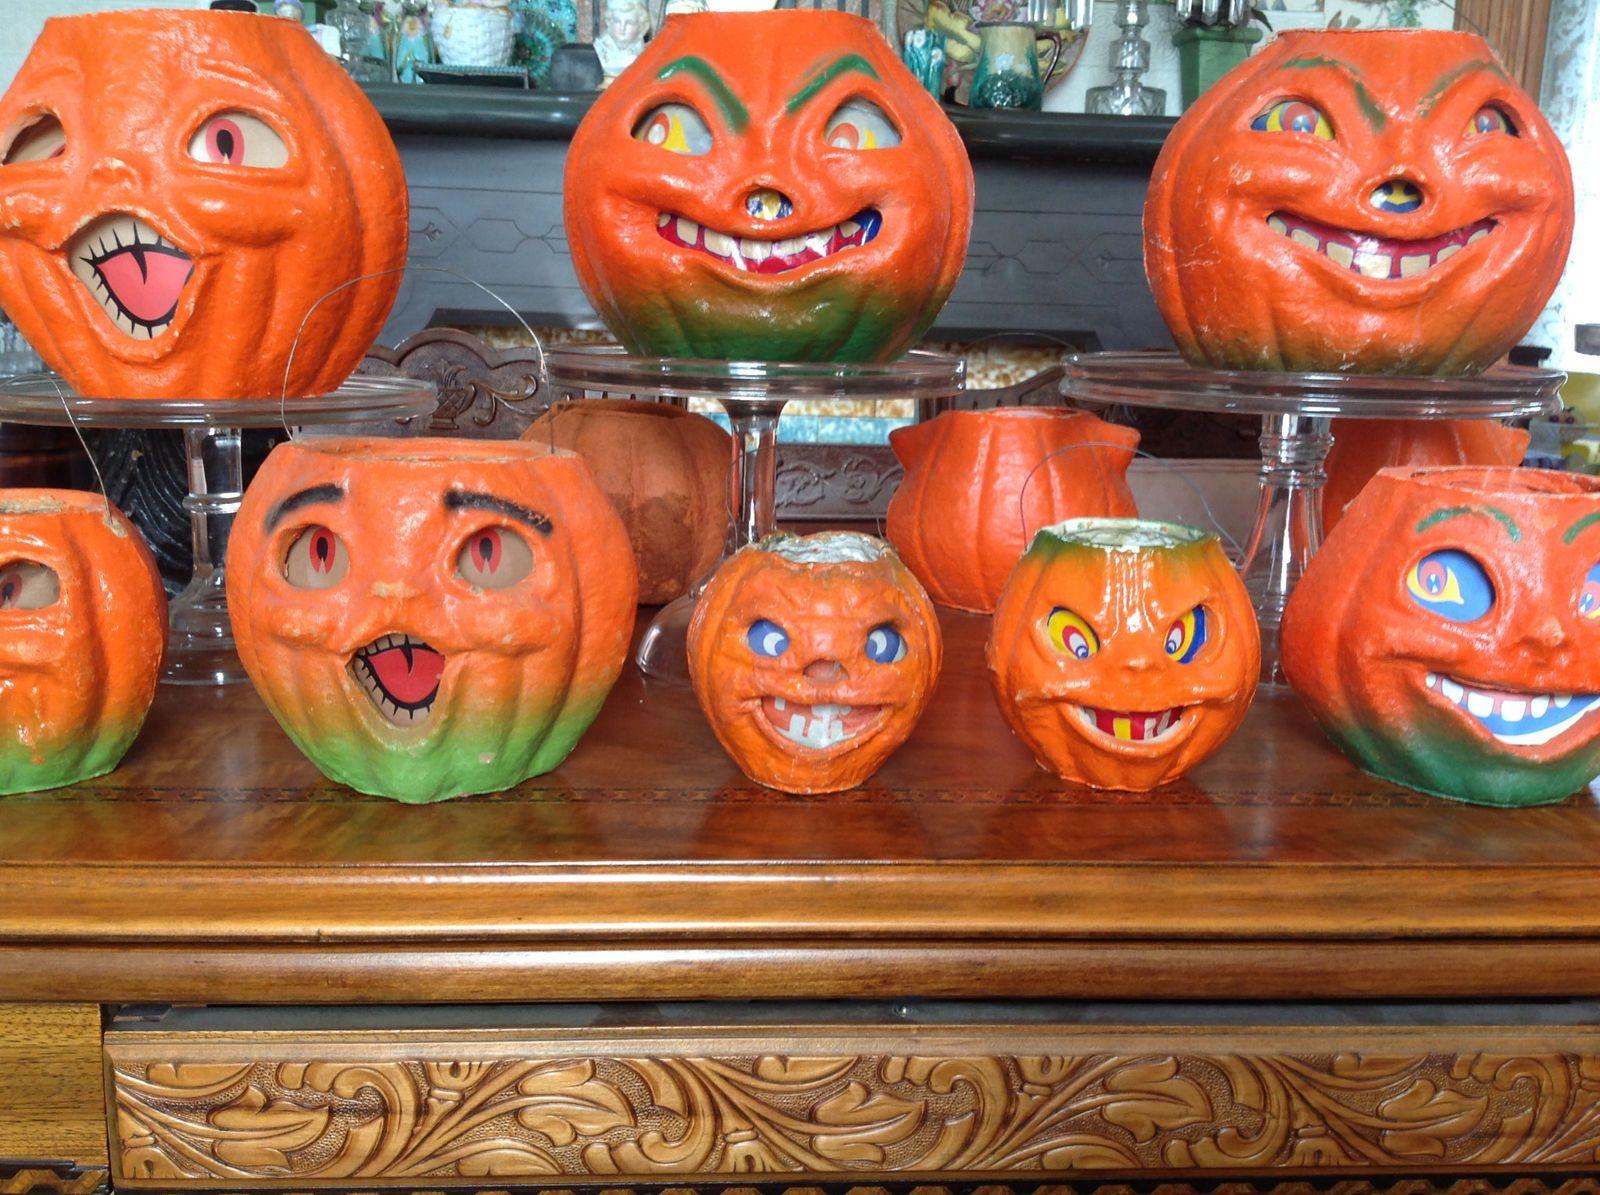 15 Vintage Halloween Jack O Lanterns Paper Mache Pulp Decorations 1940 S Inserts Ebay Halloween Jack O Lanterns Vintage Halloween Halloween Jack